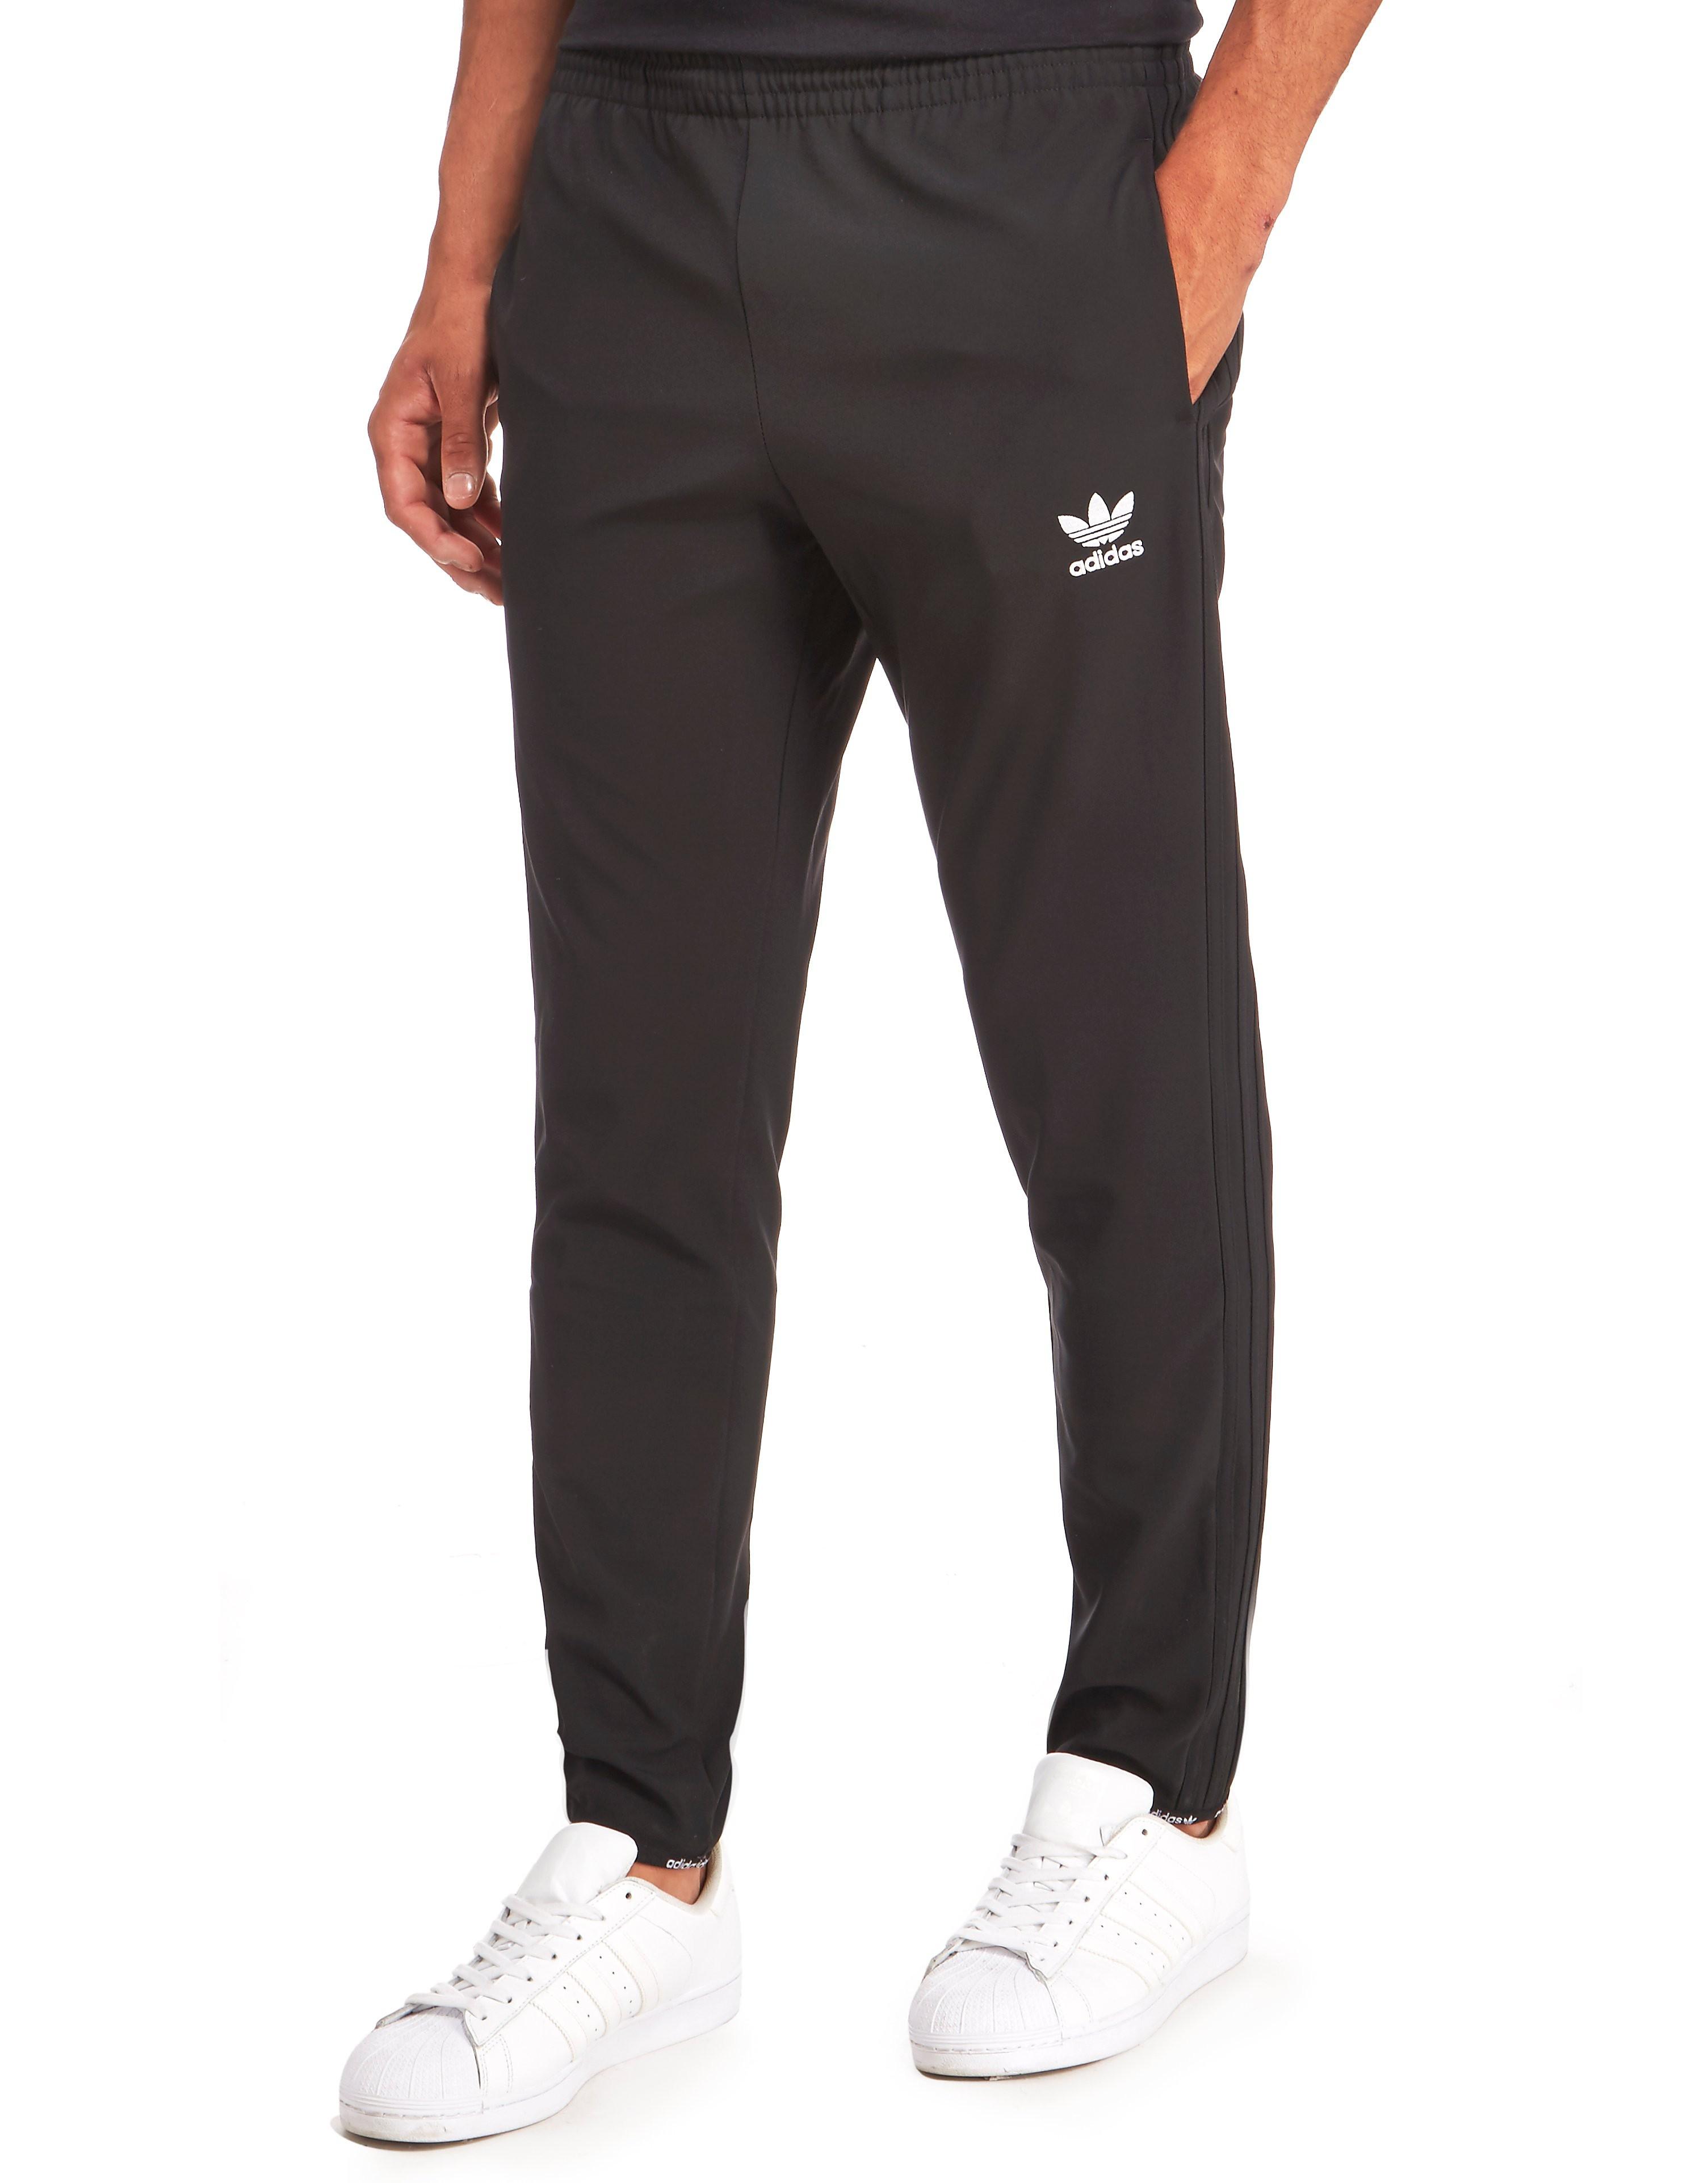 adidas Originals Superstar 2.0 Poly Track Pants